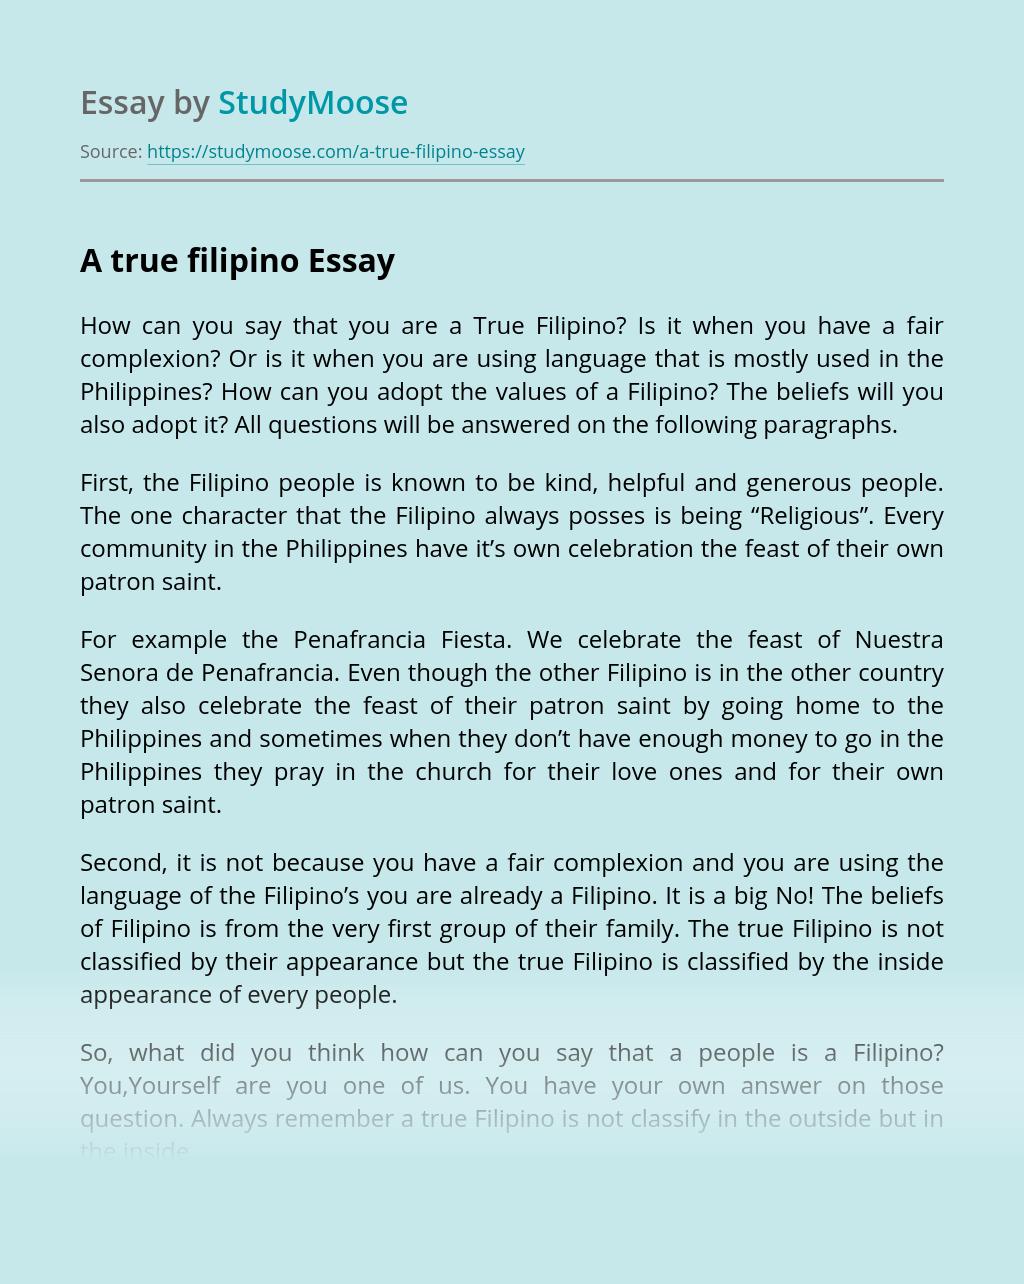 A true filipino